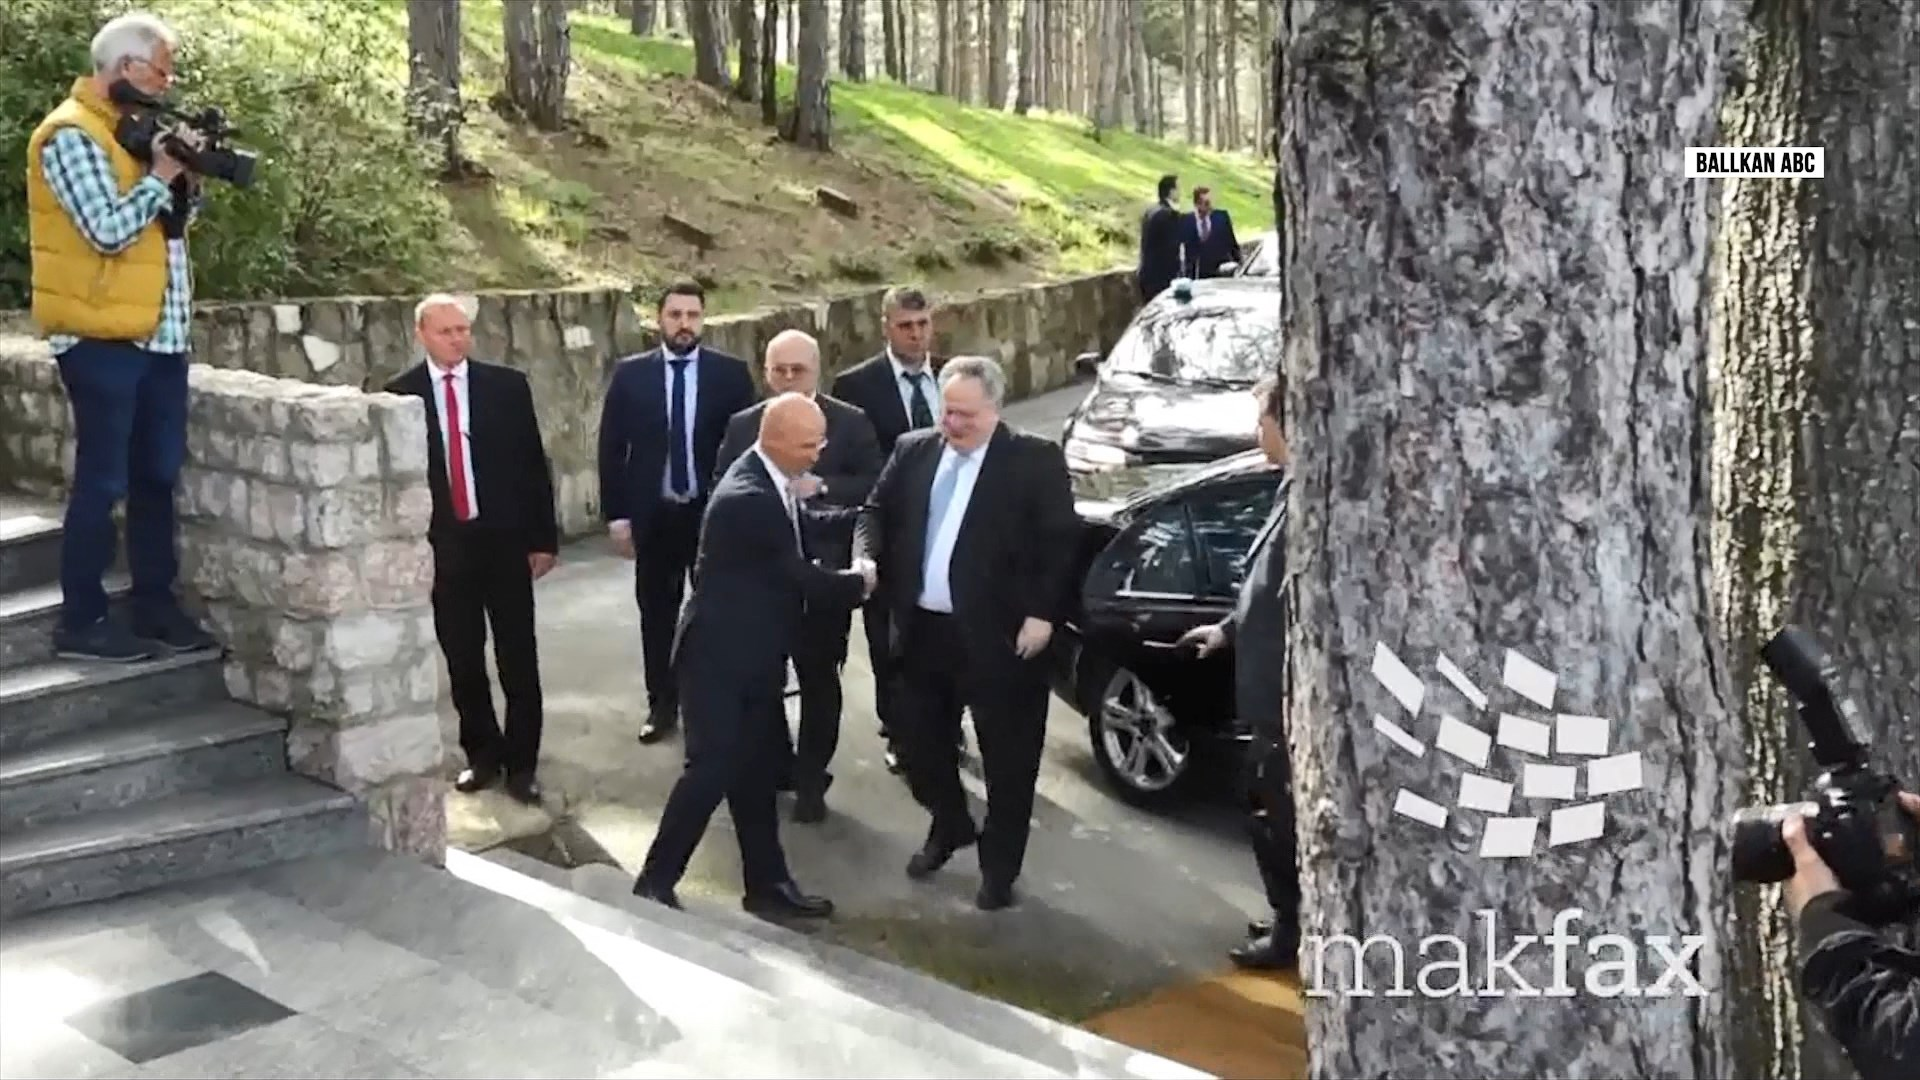 Turi ballkanik i Kotzias